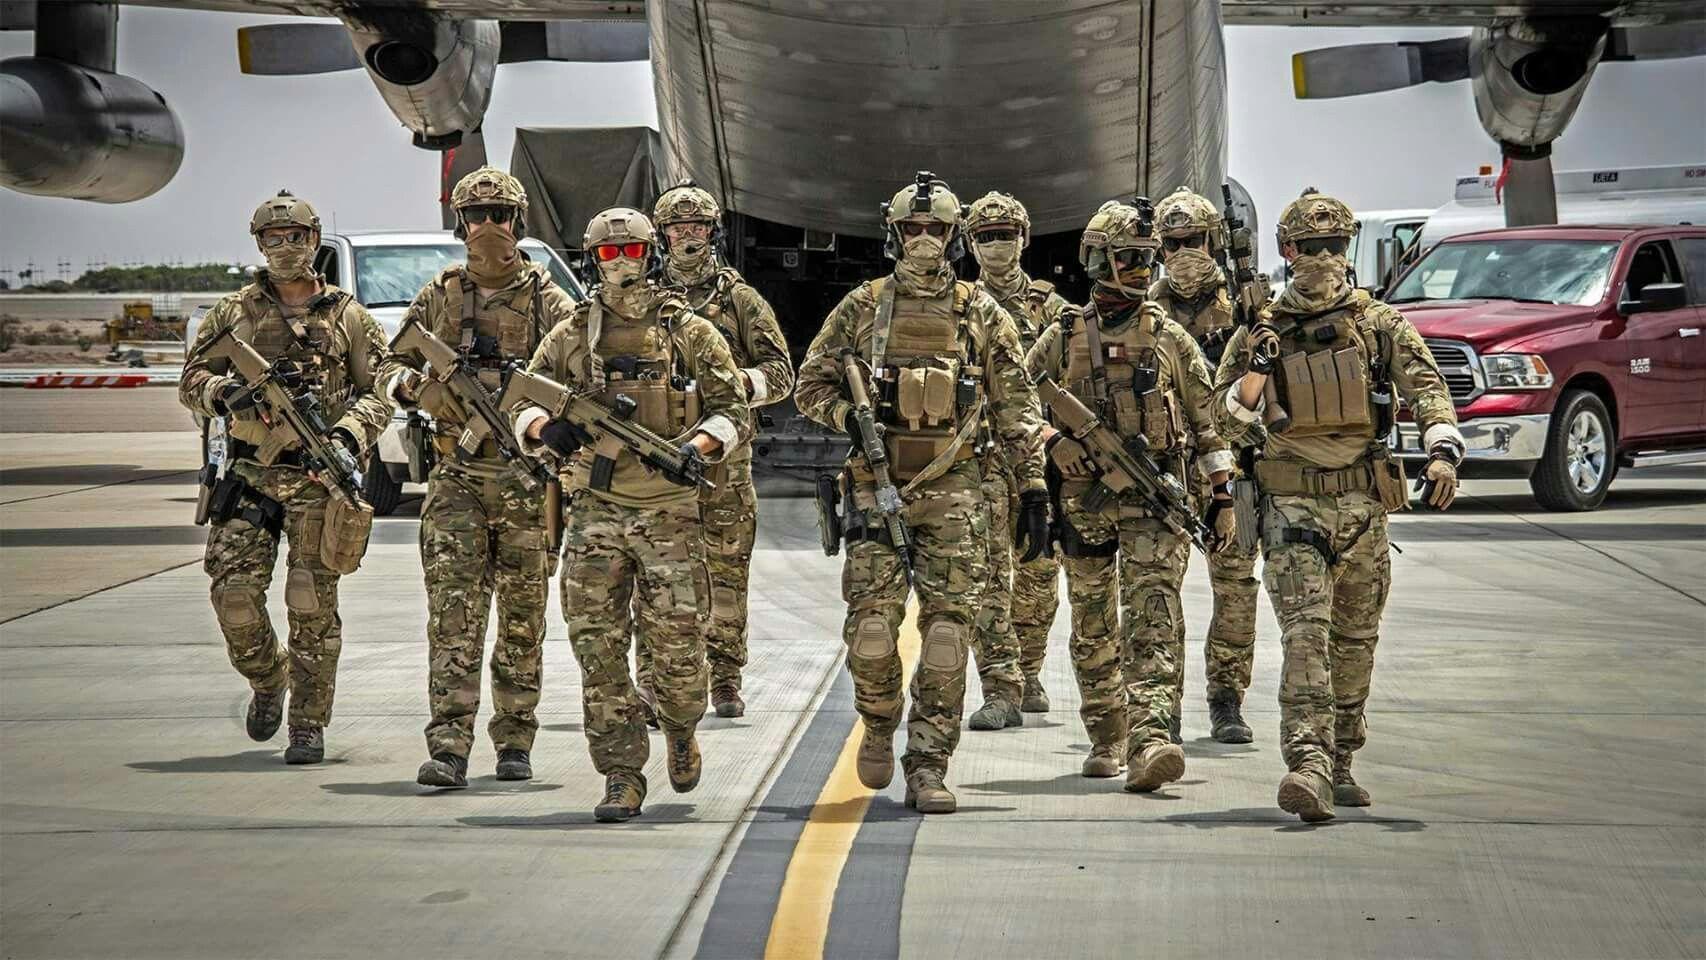 Pin by Dominic Webster on Guns u Military  Pinterest  Guns